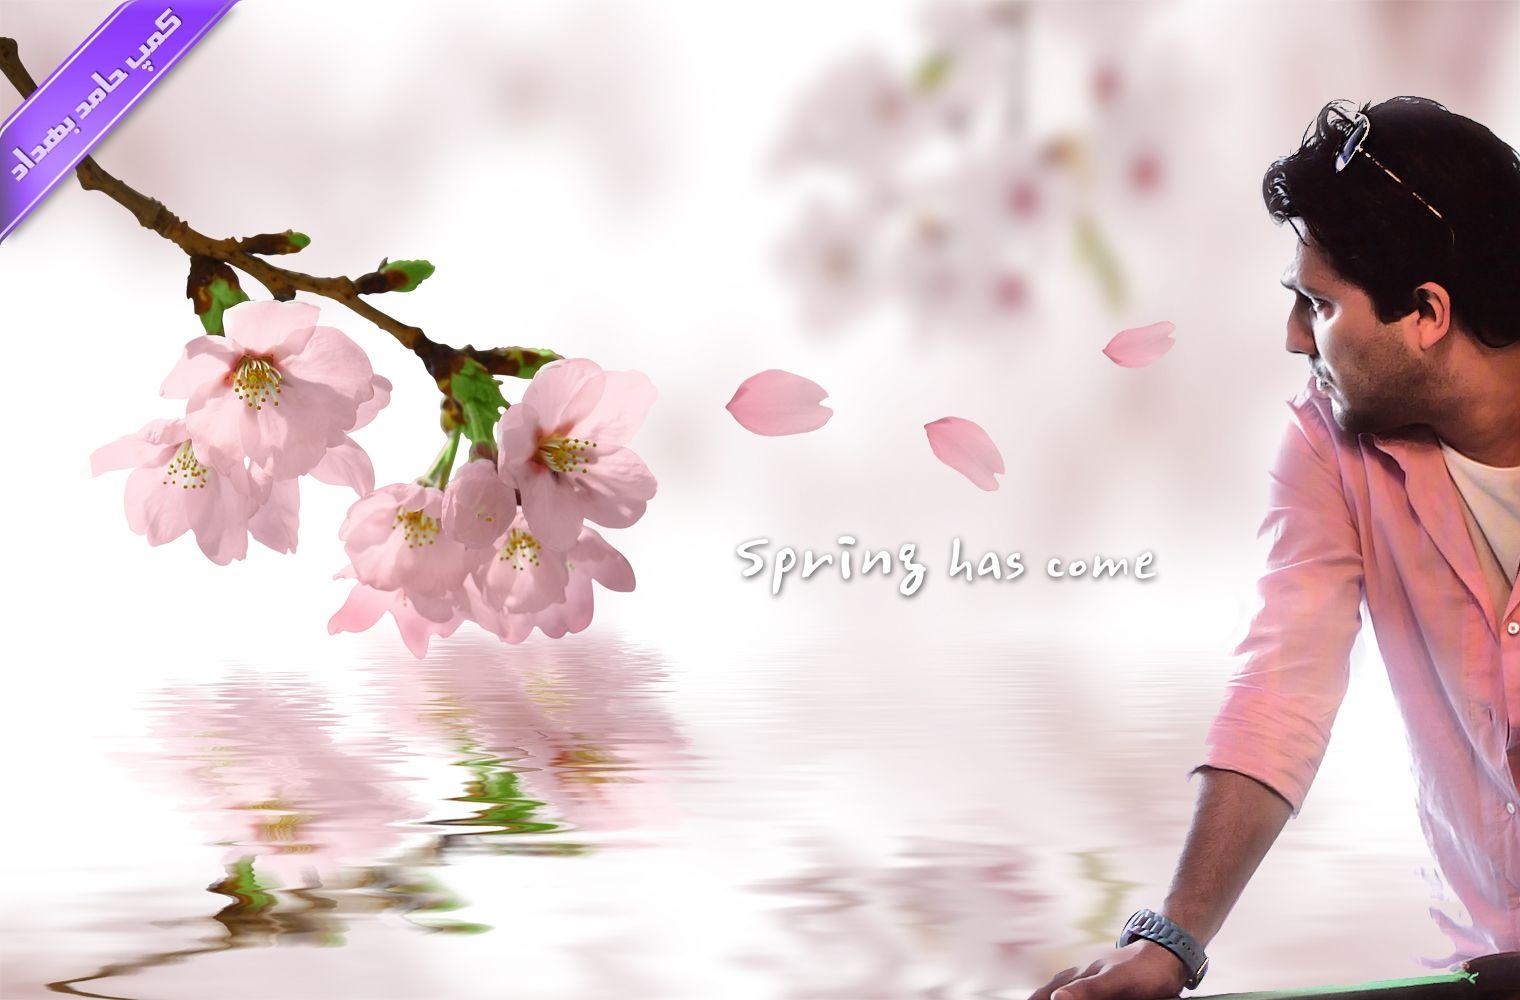 Hamed Behdad In 2020 Japan Flower Cherry Blossom